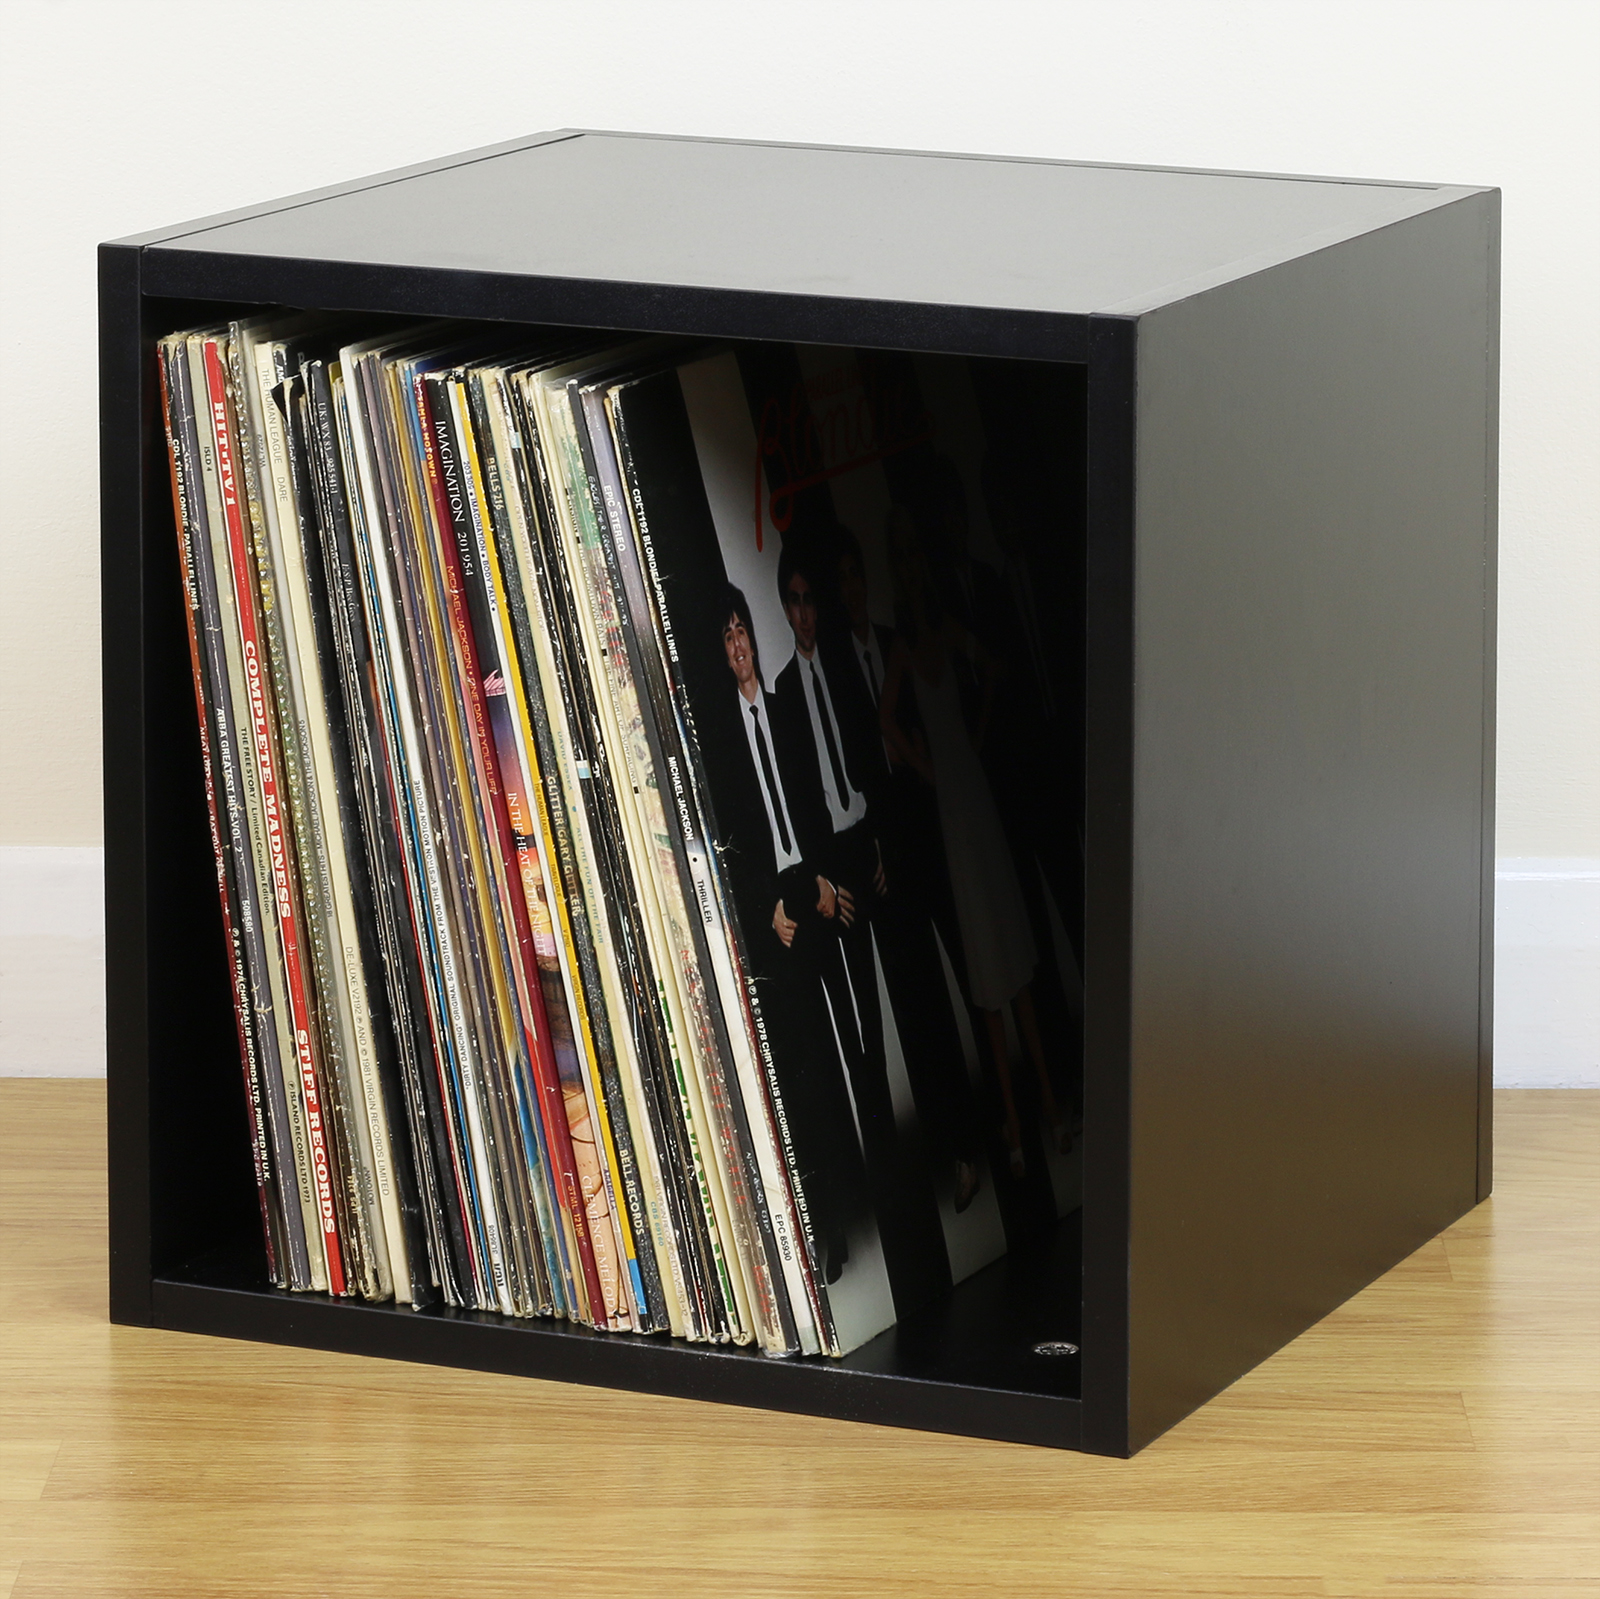 Black Square Lp Vinyl Music Record Storage Cube Cabinet